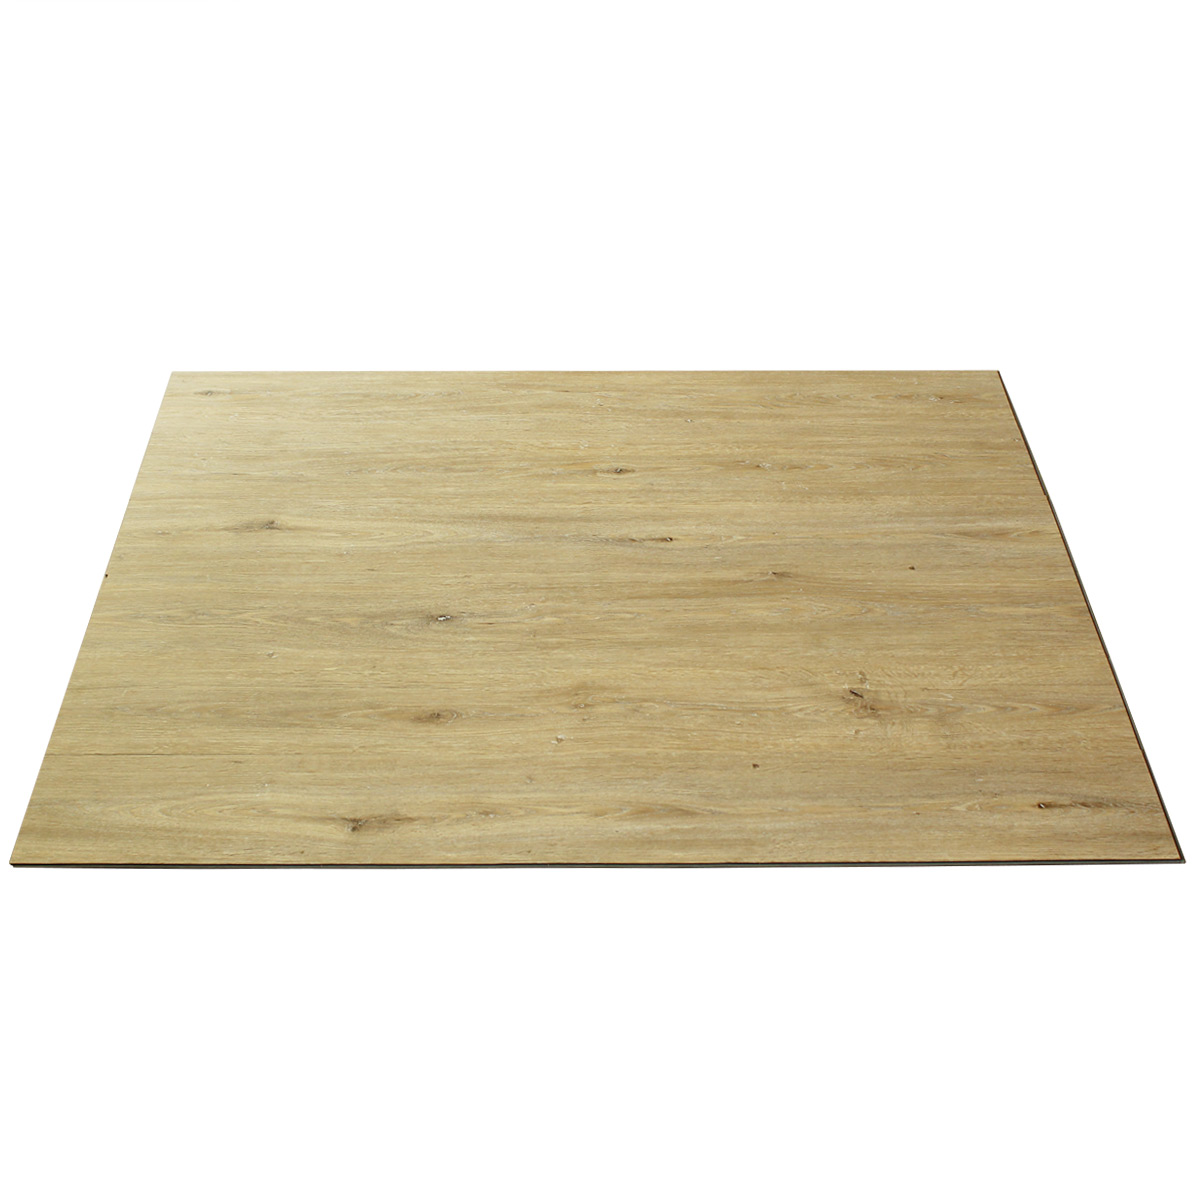 neuholz 2 4 m click vinyl laminate vinyl flooring oak. Black Bedroom Furniture Sets. Home Design Ideas